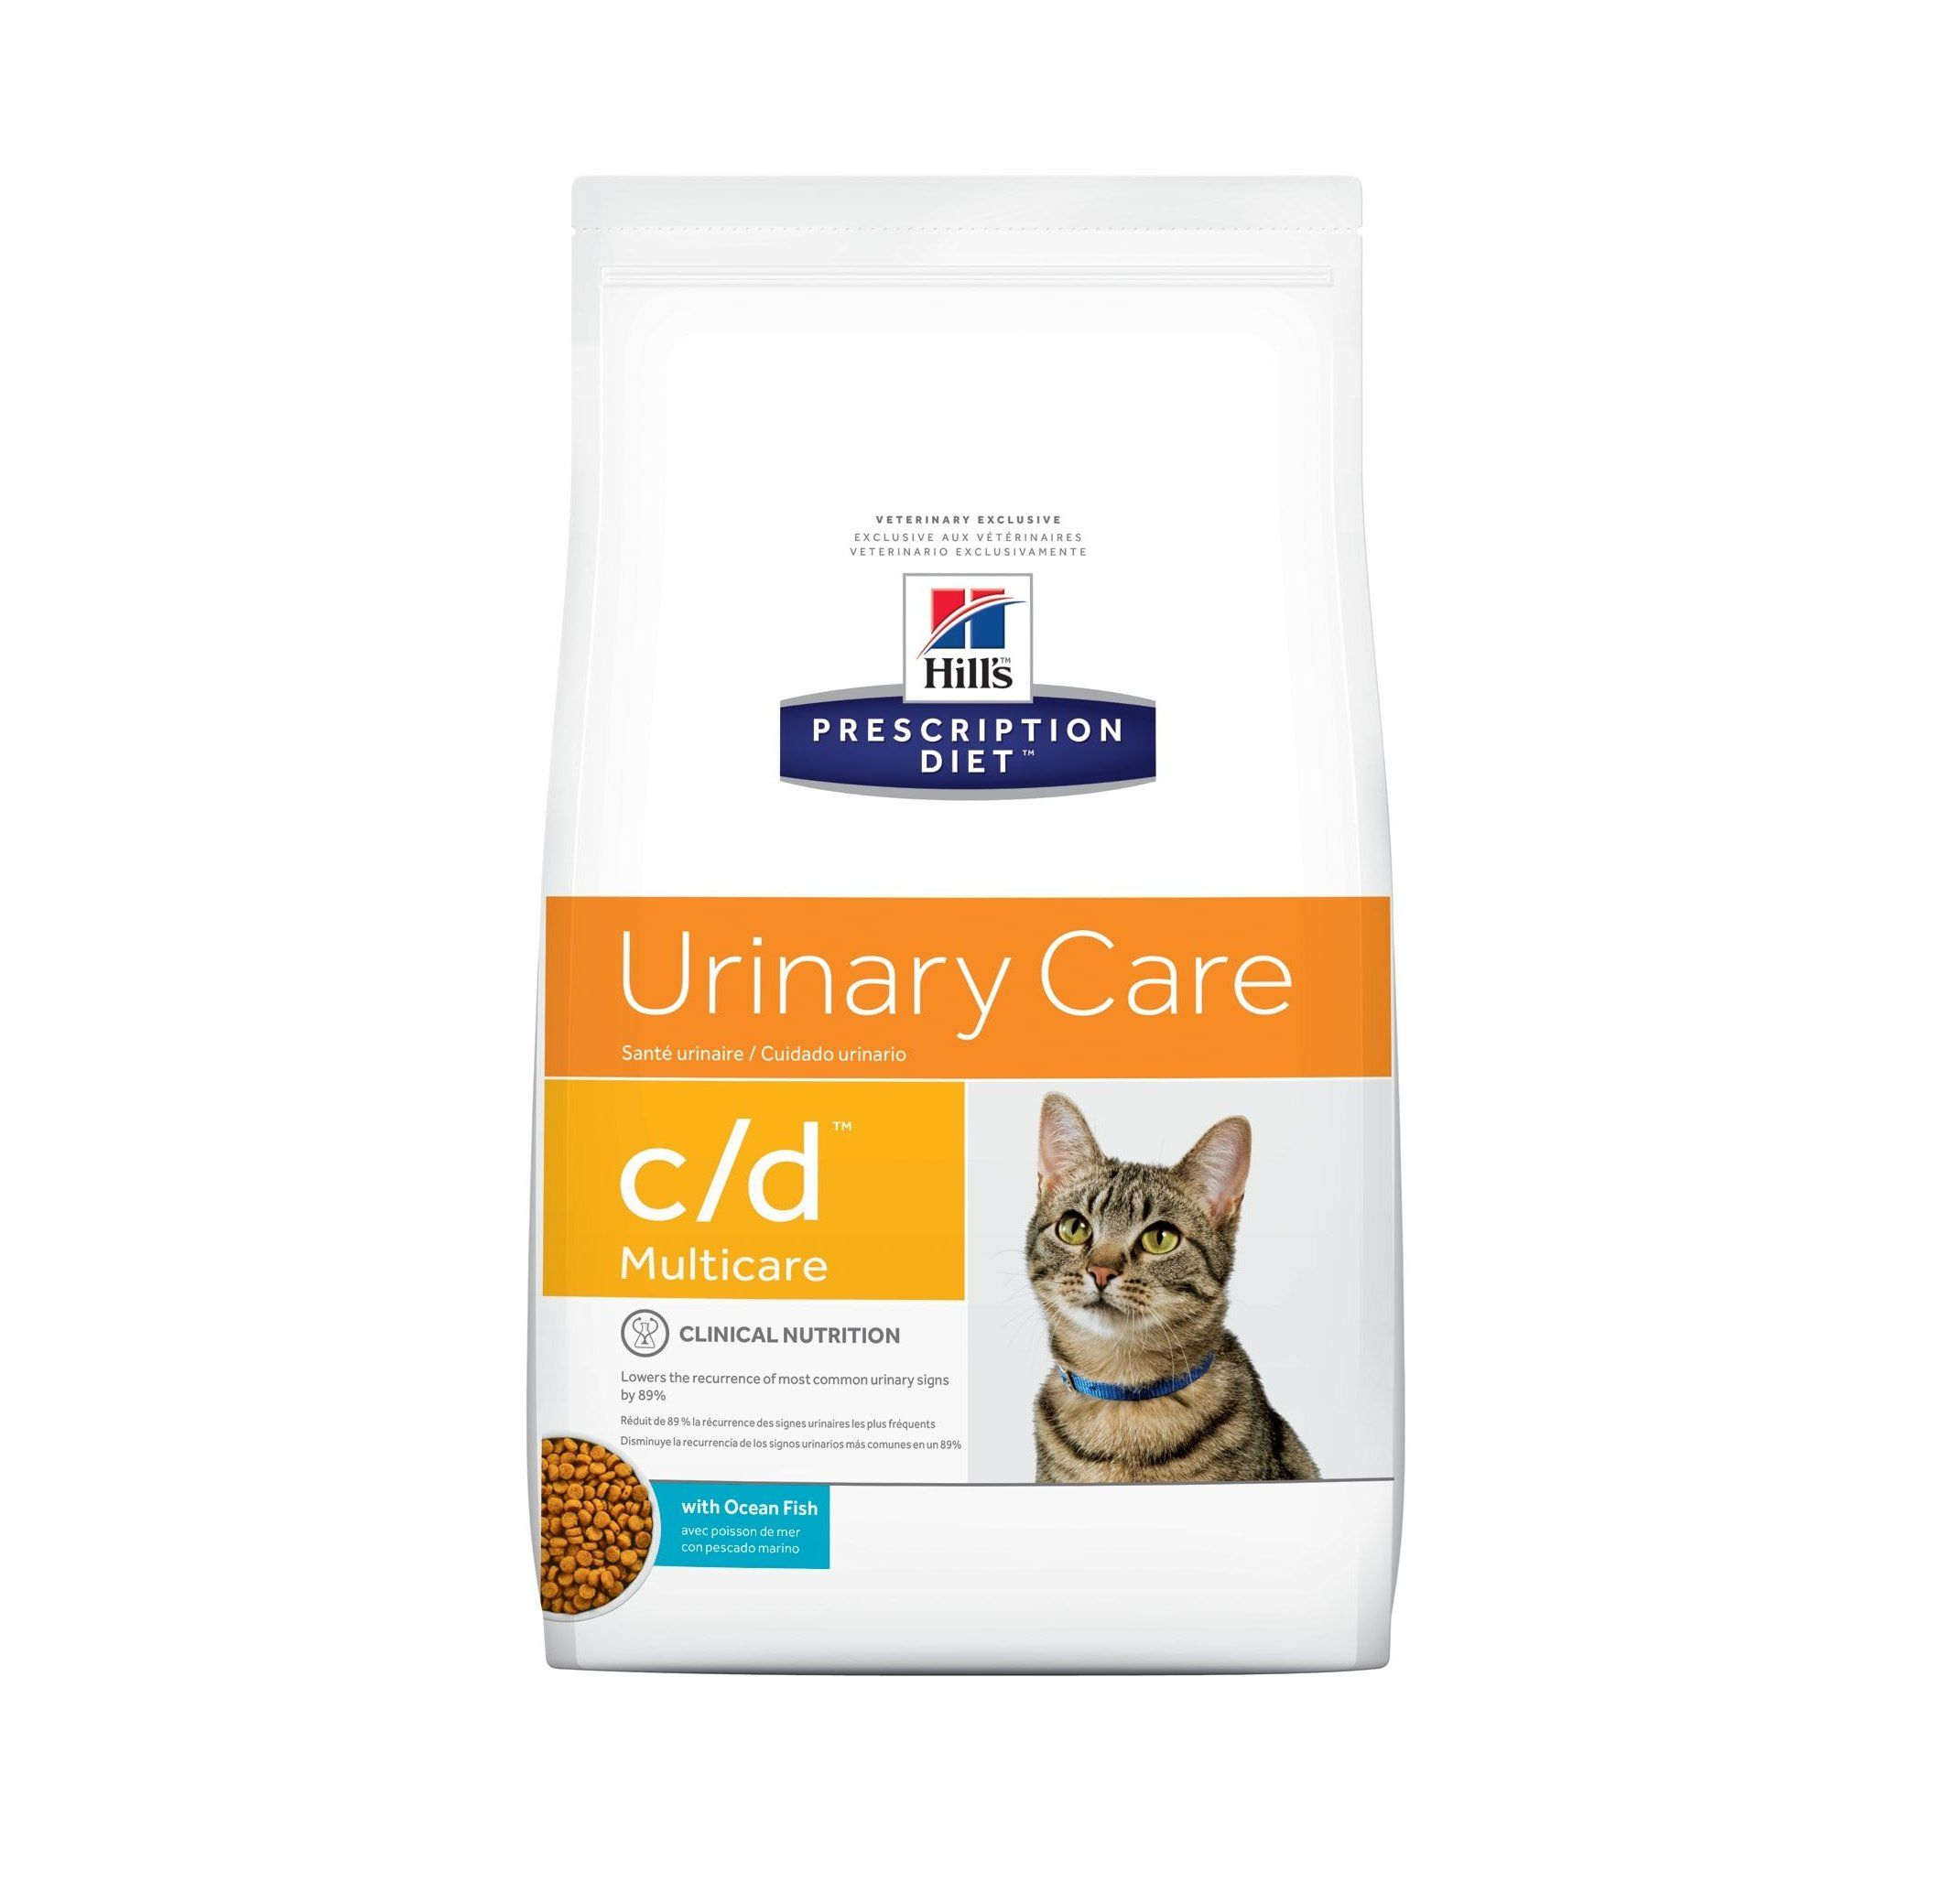 Hill's Prescription Diet c/d Multicare Urinary Care with